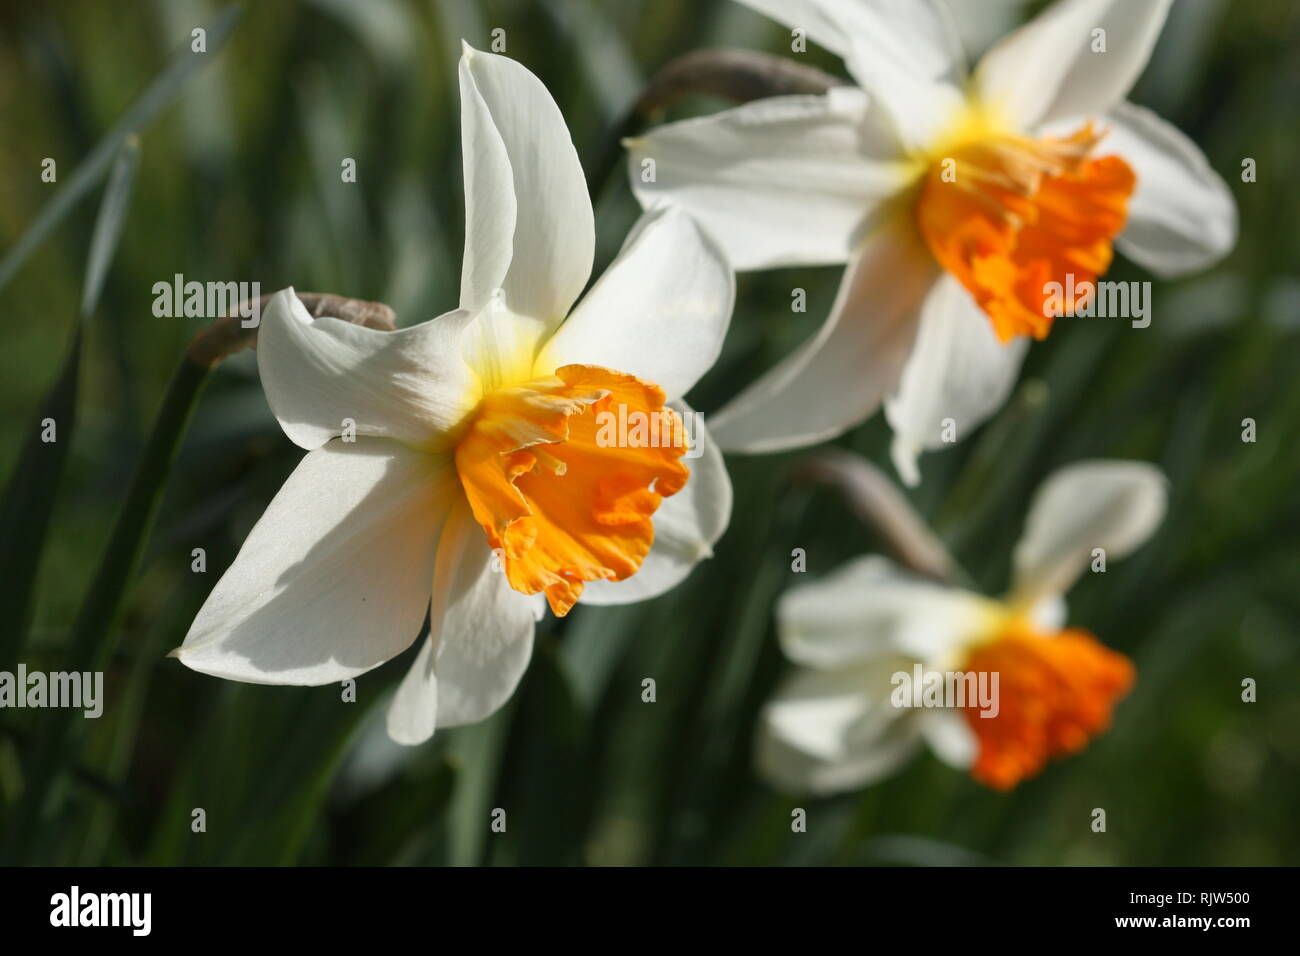 White daffodil flowers Stock Photo